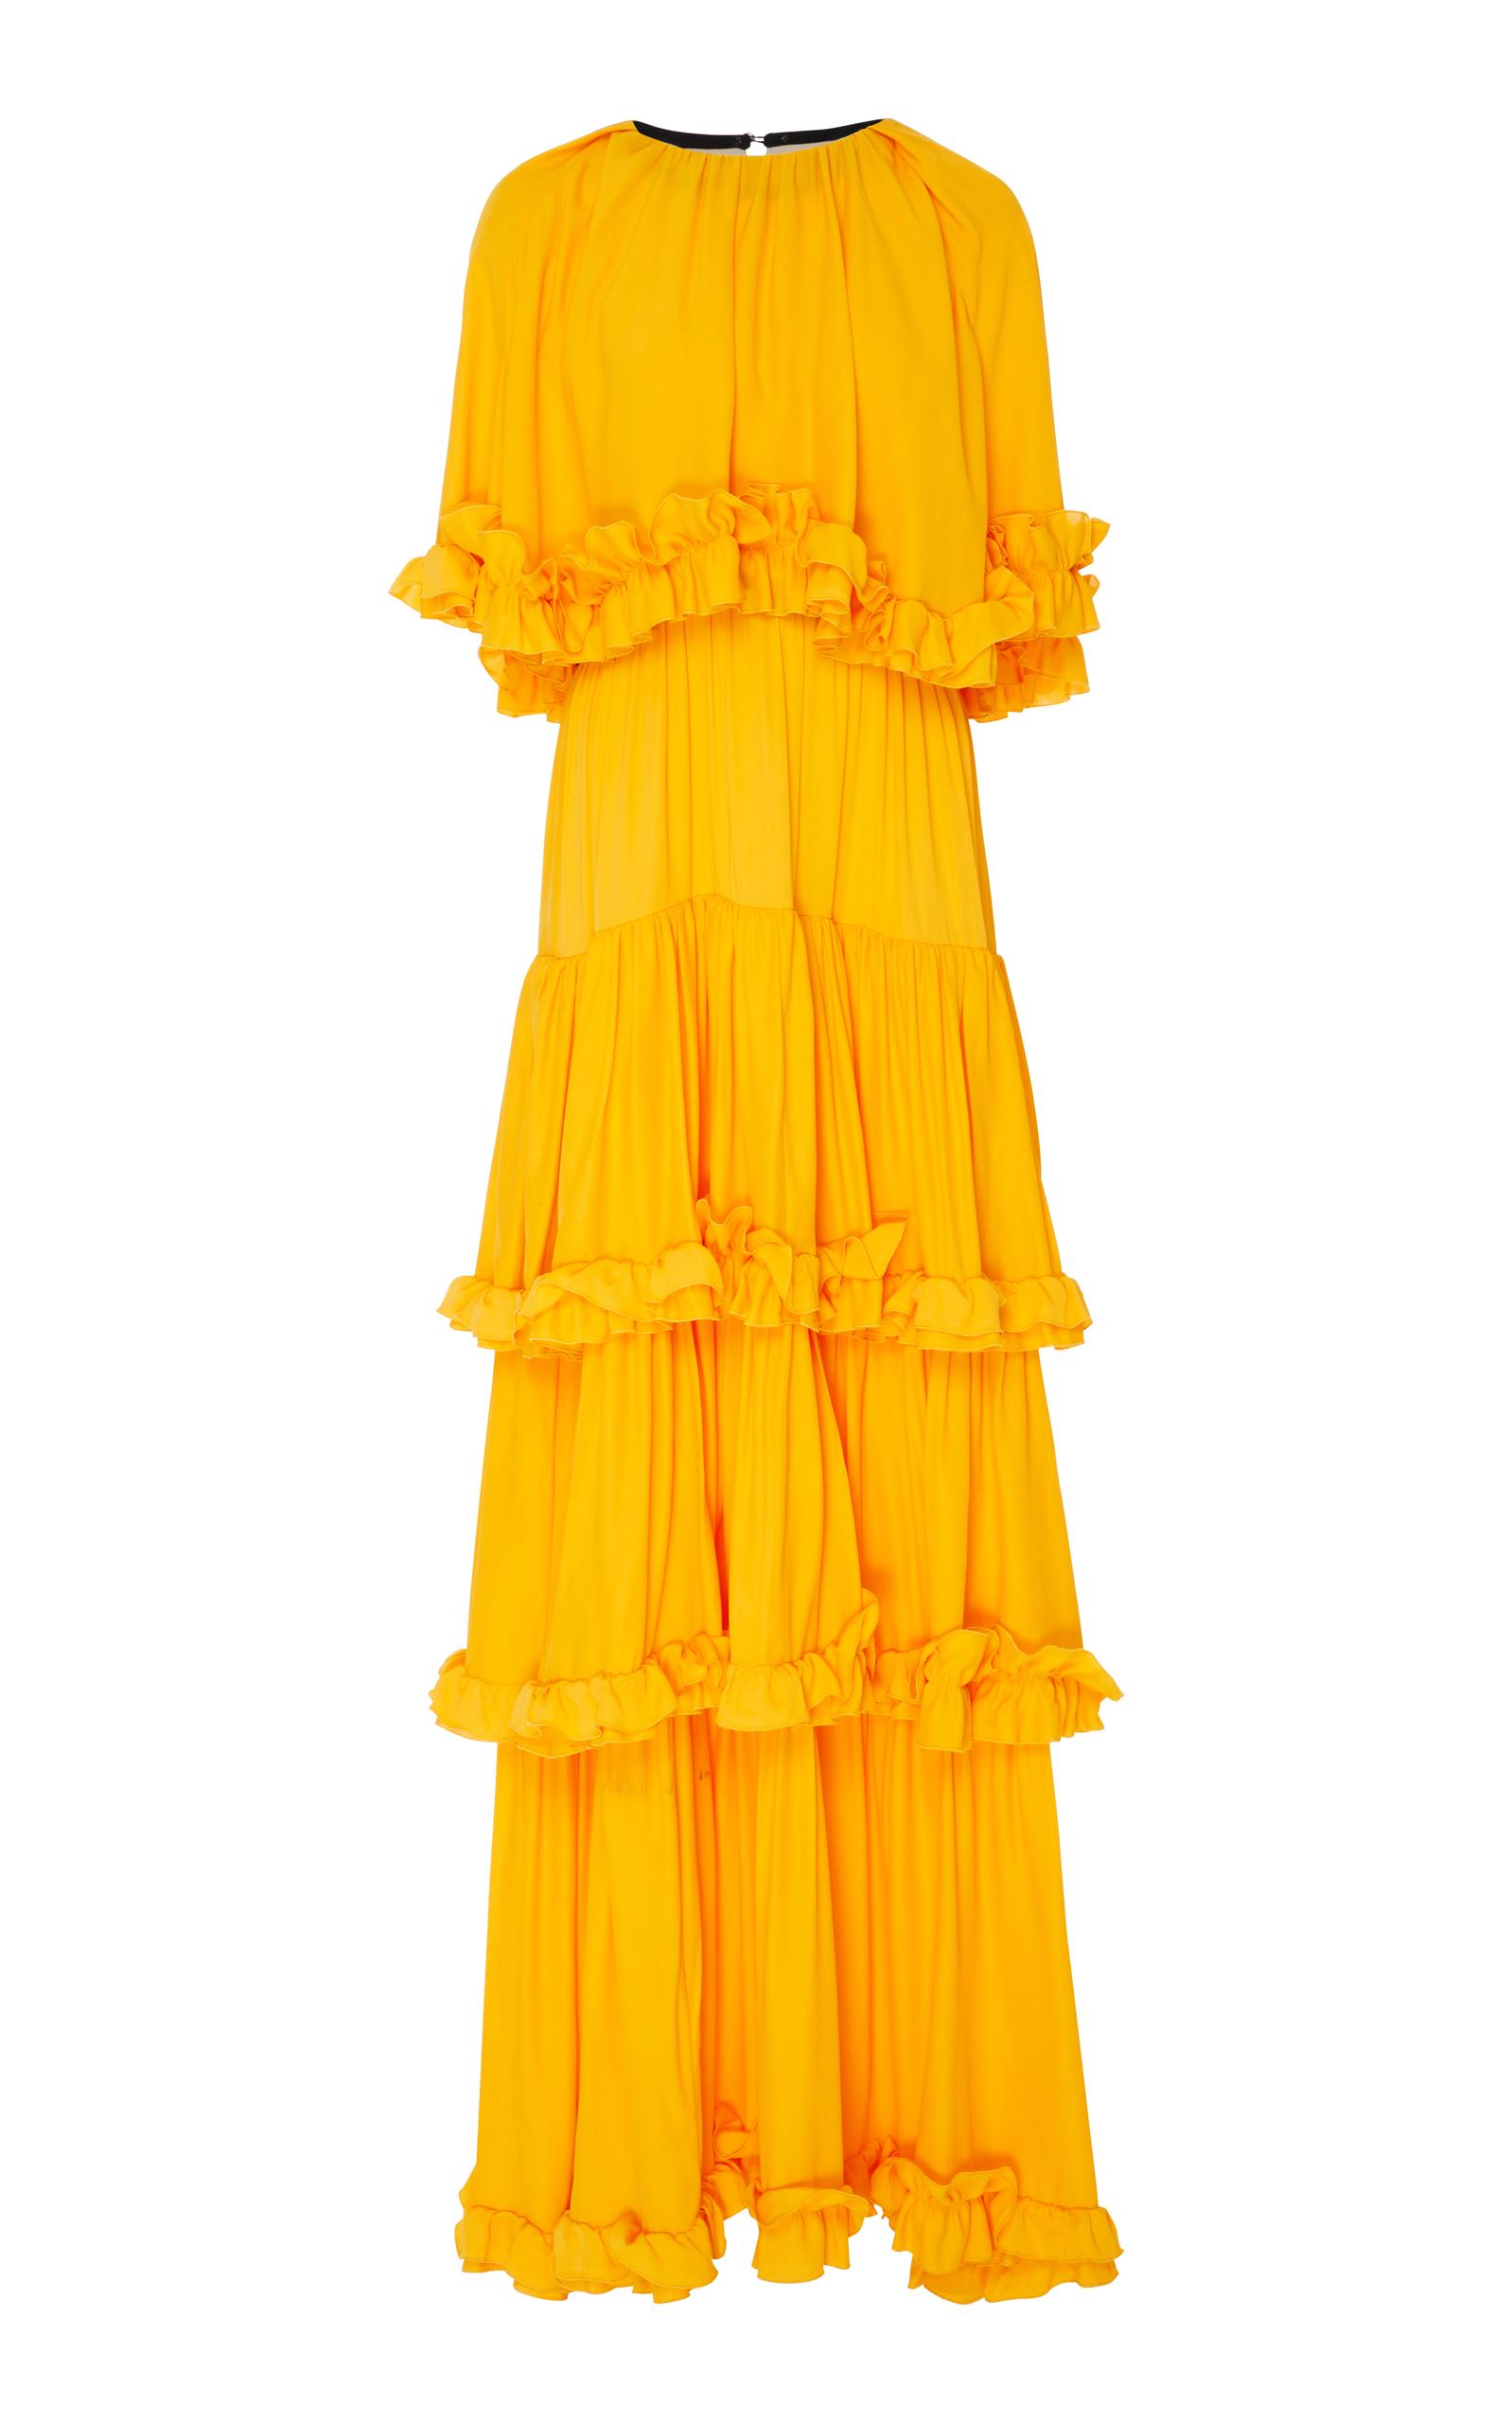 Cape dress maxi indonesia